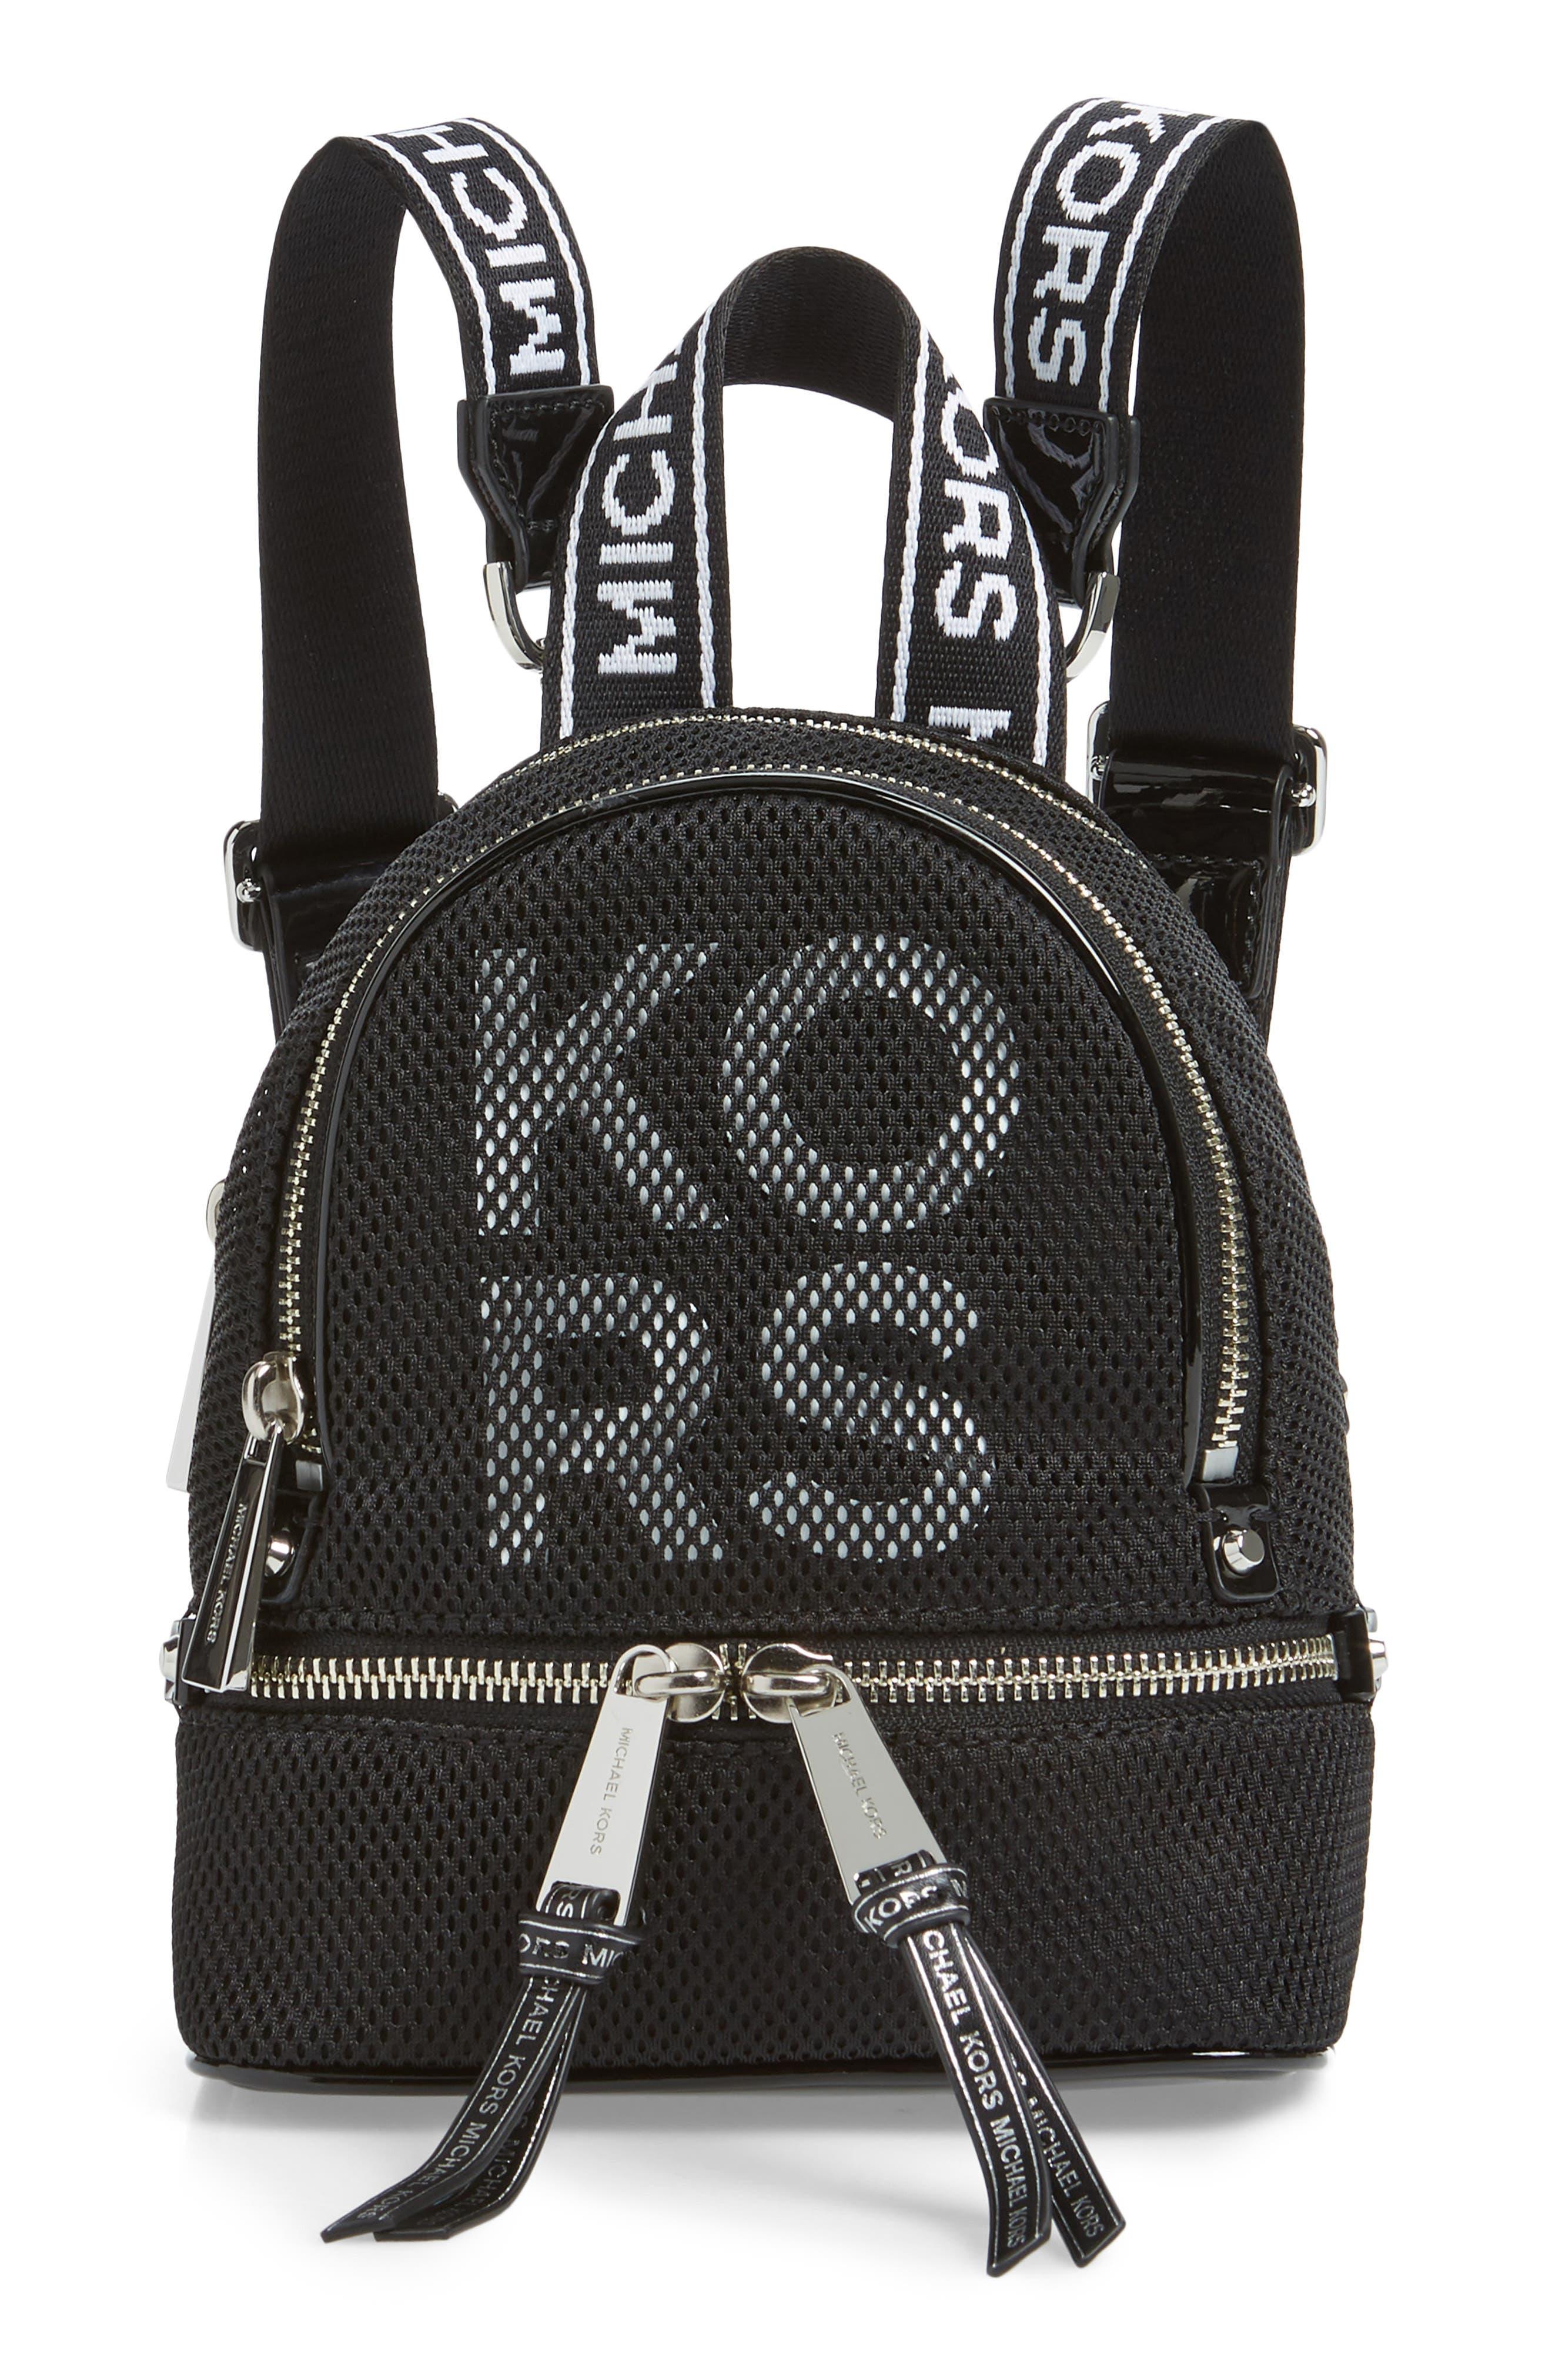 MICHAEL MICHAEL KORS, Extra Small Rhea Mesh Backpack, Main thumbnail 1, color, BLACK/ OPTIC WHITE